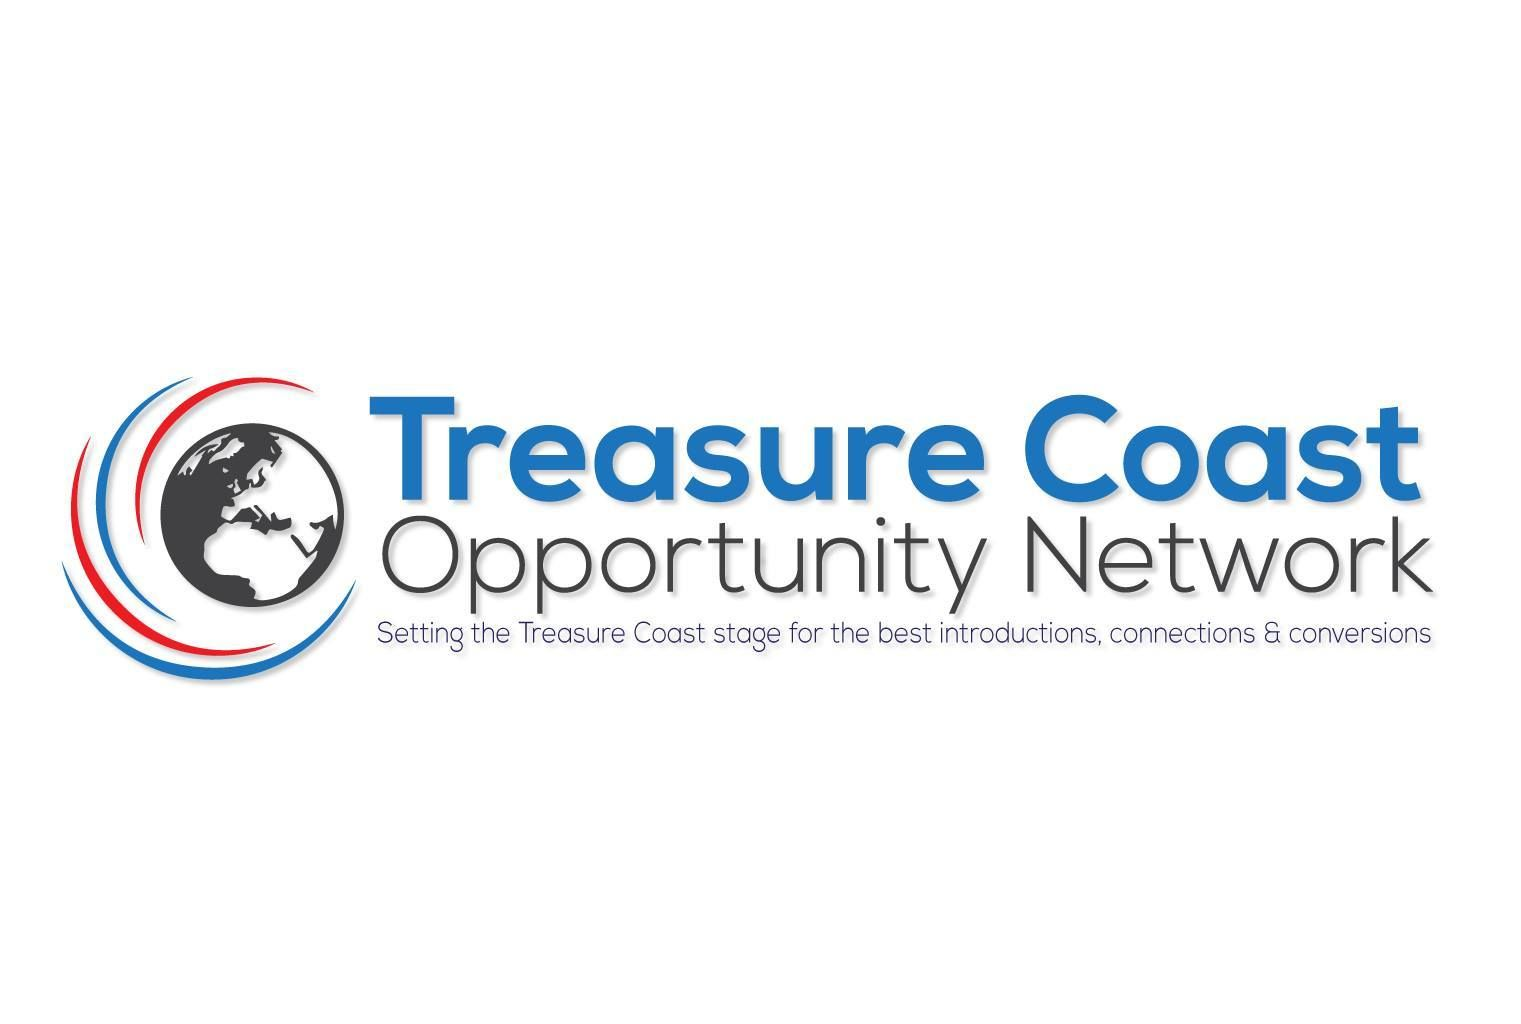 Treasure Coast Opportunity Network